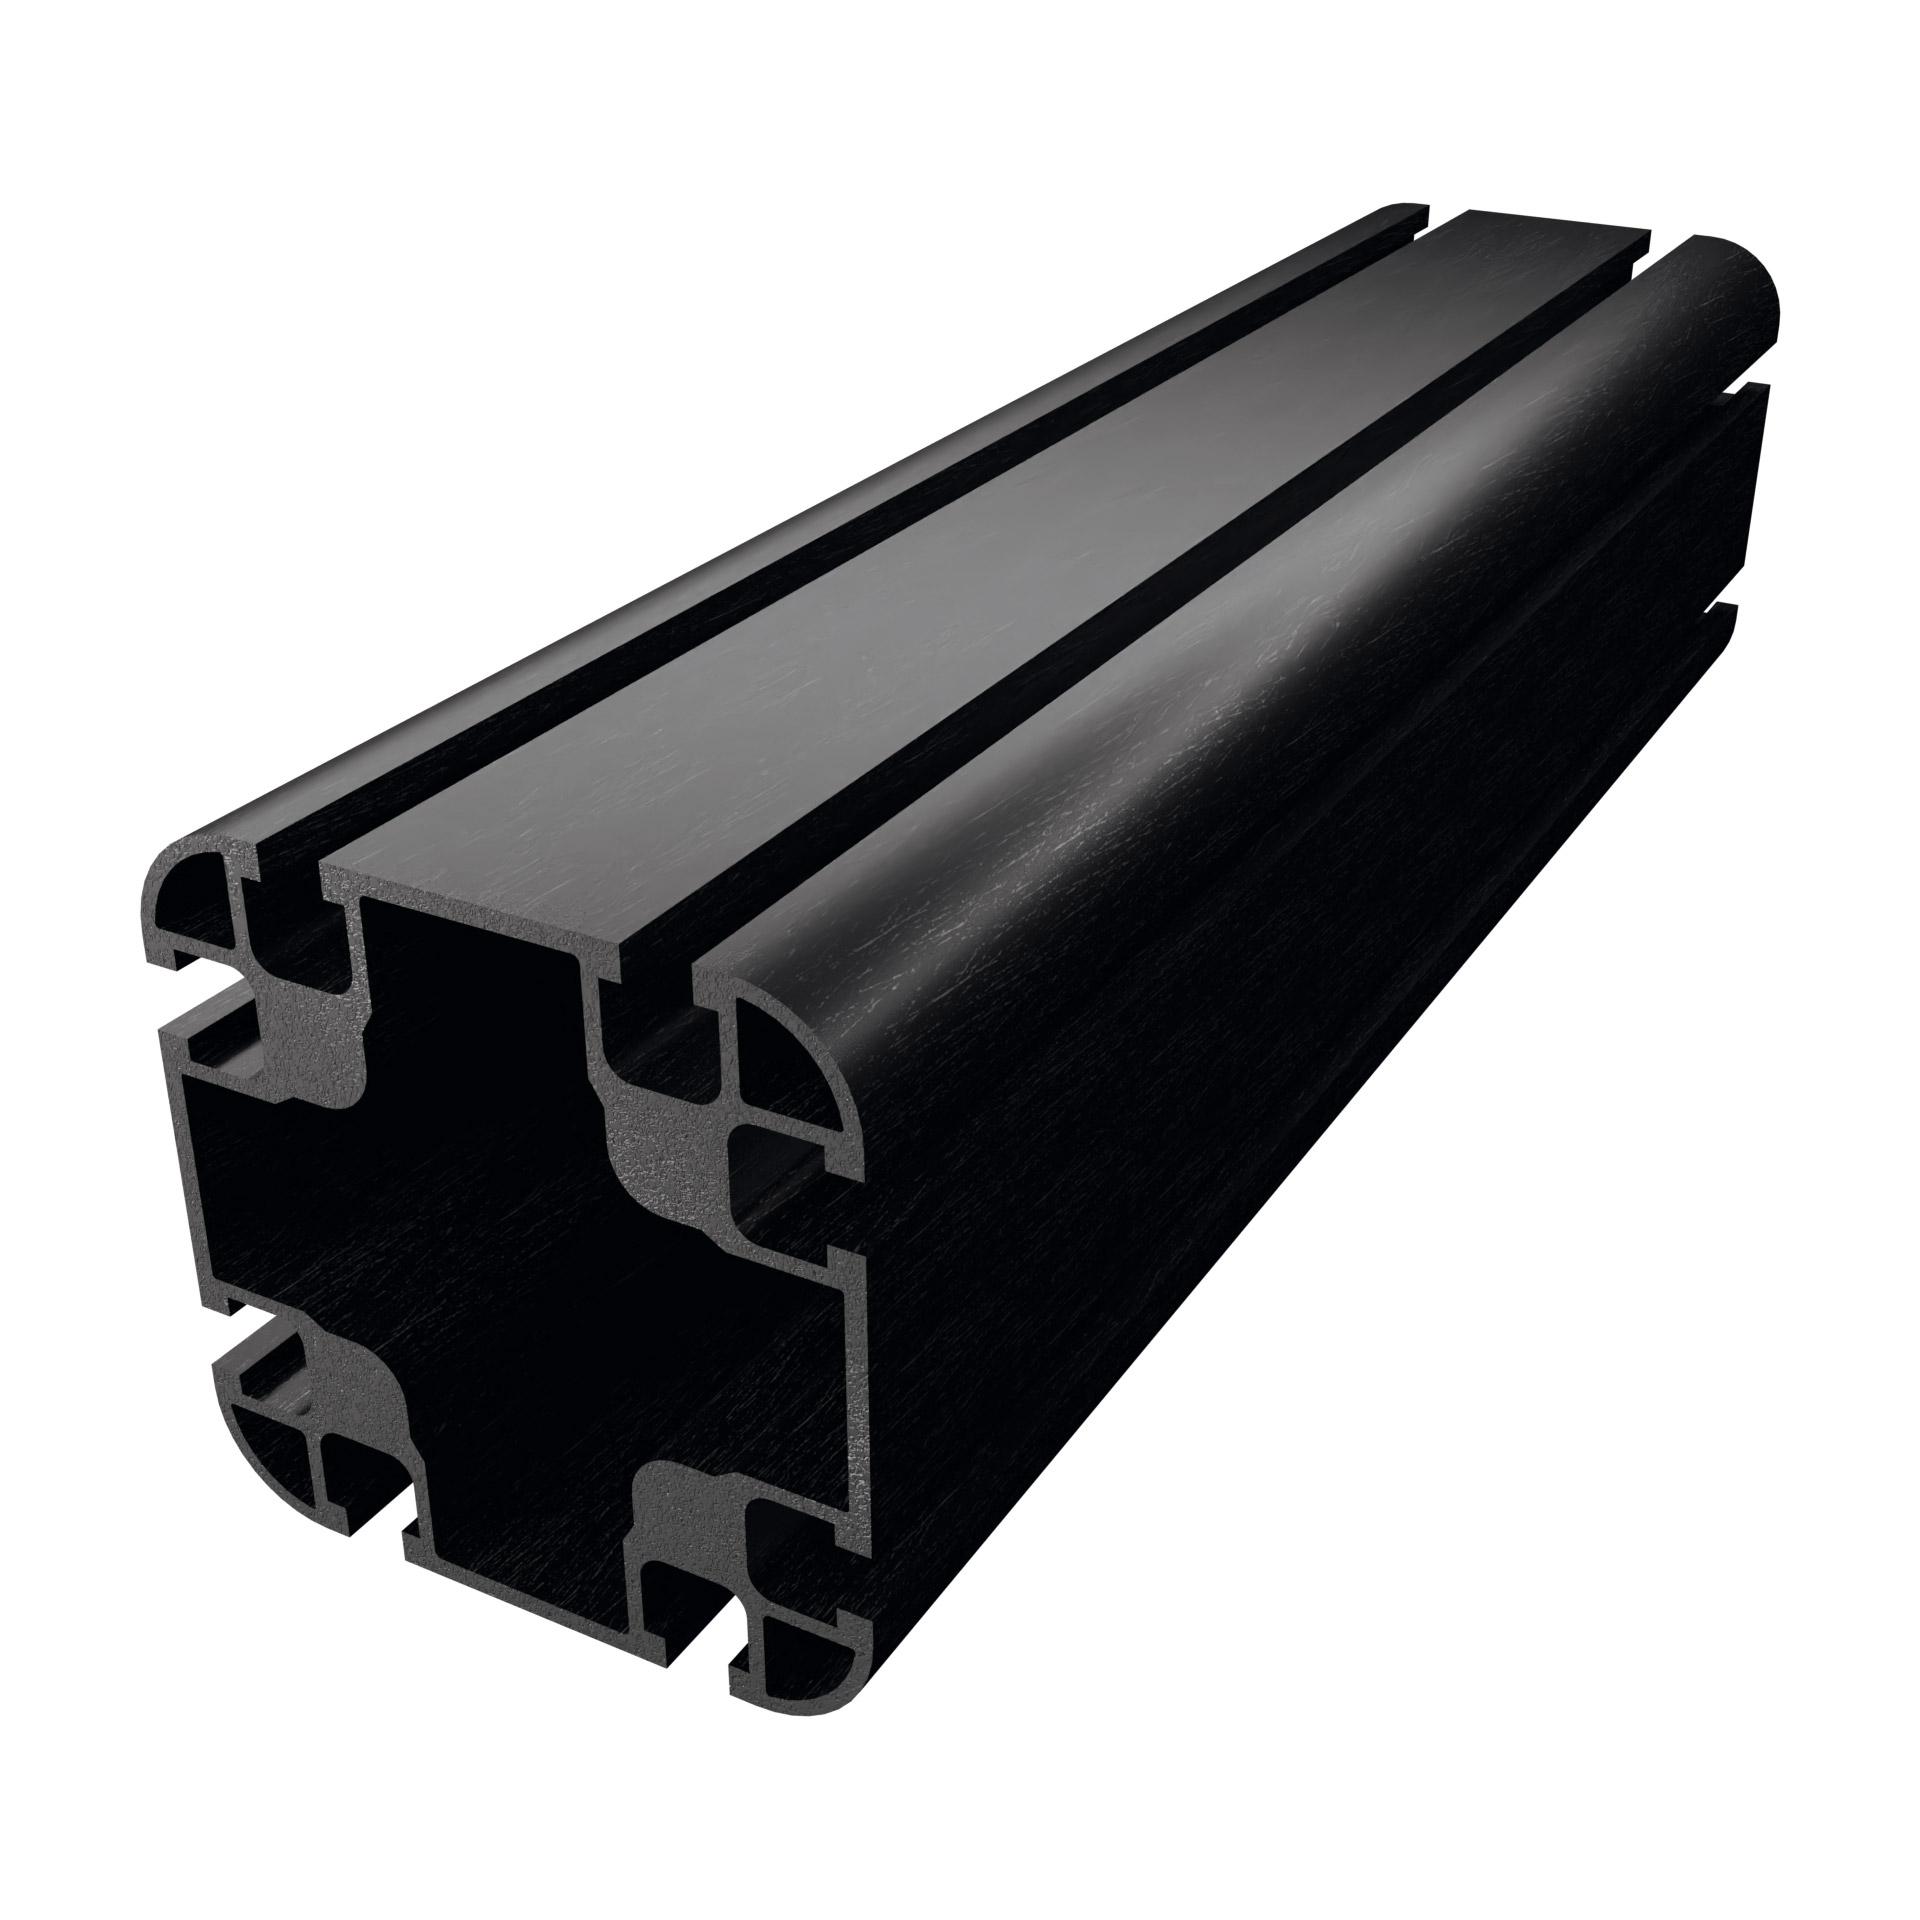 Carbosix Profilo in fibra di carbonio 90x90